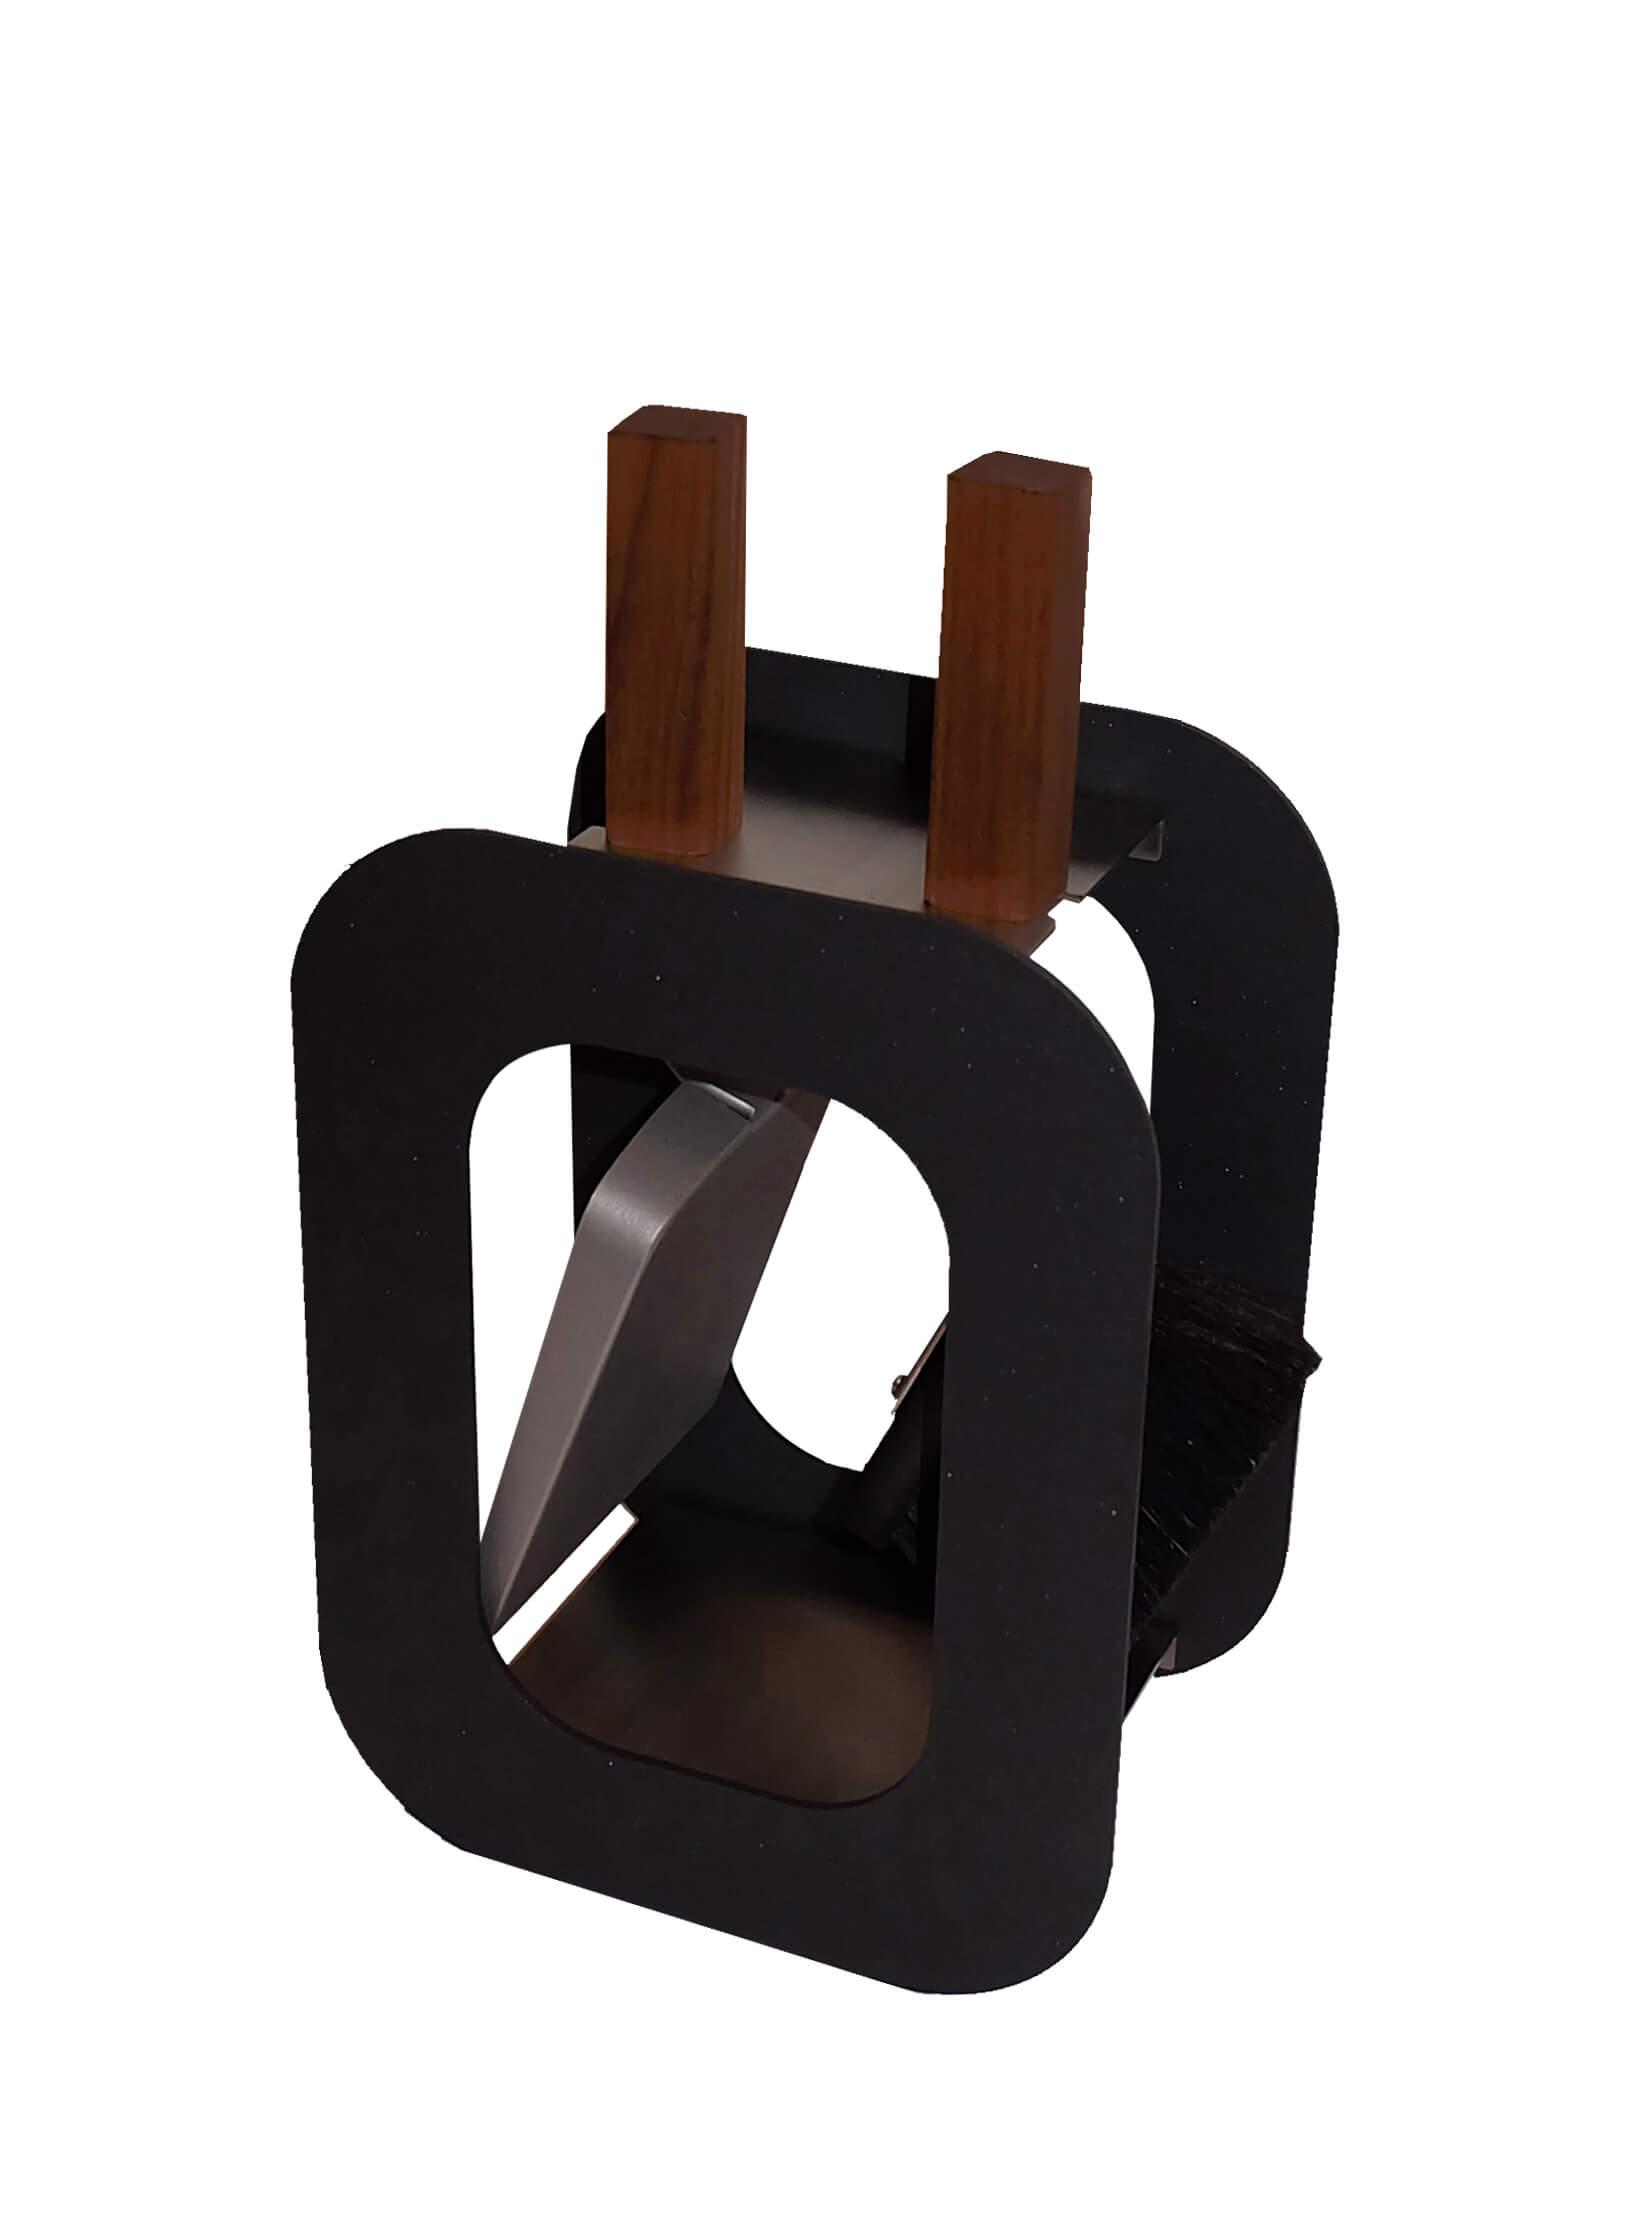 Kaminbesteck Lienbacher Cube 2-teilig, Schwarz